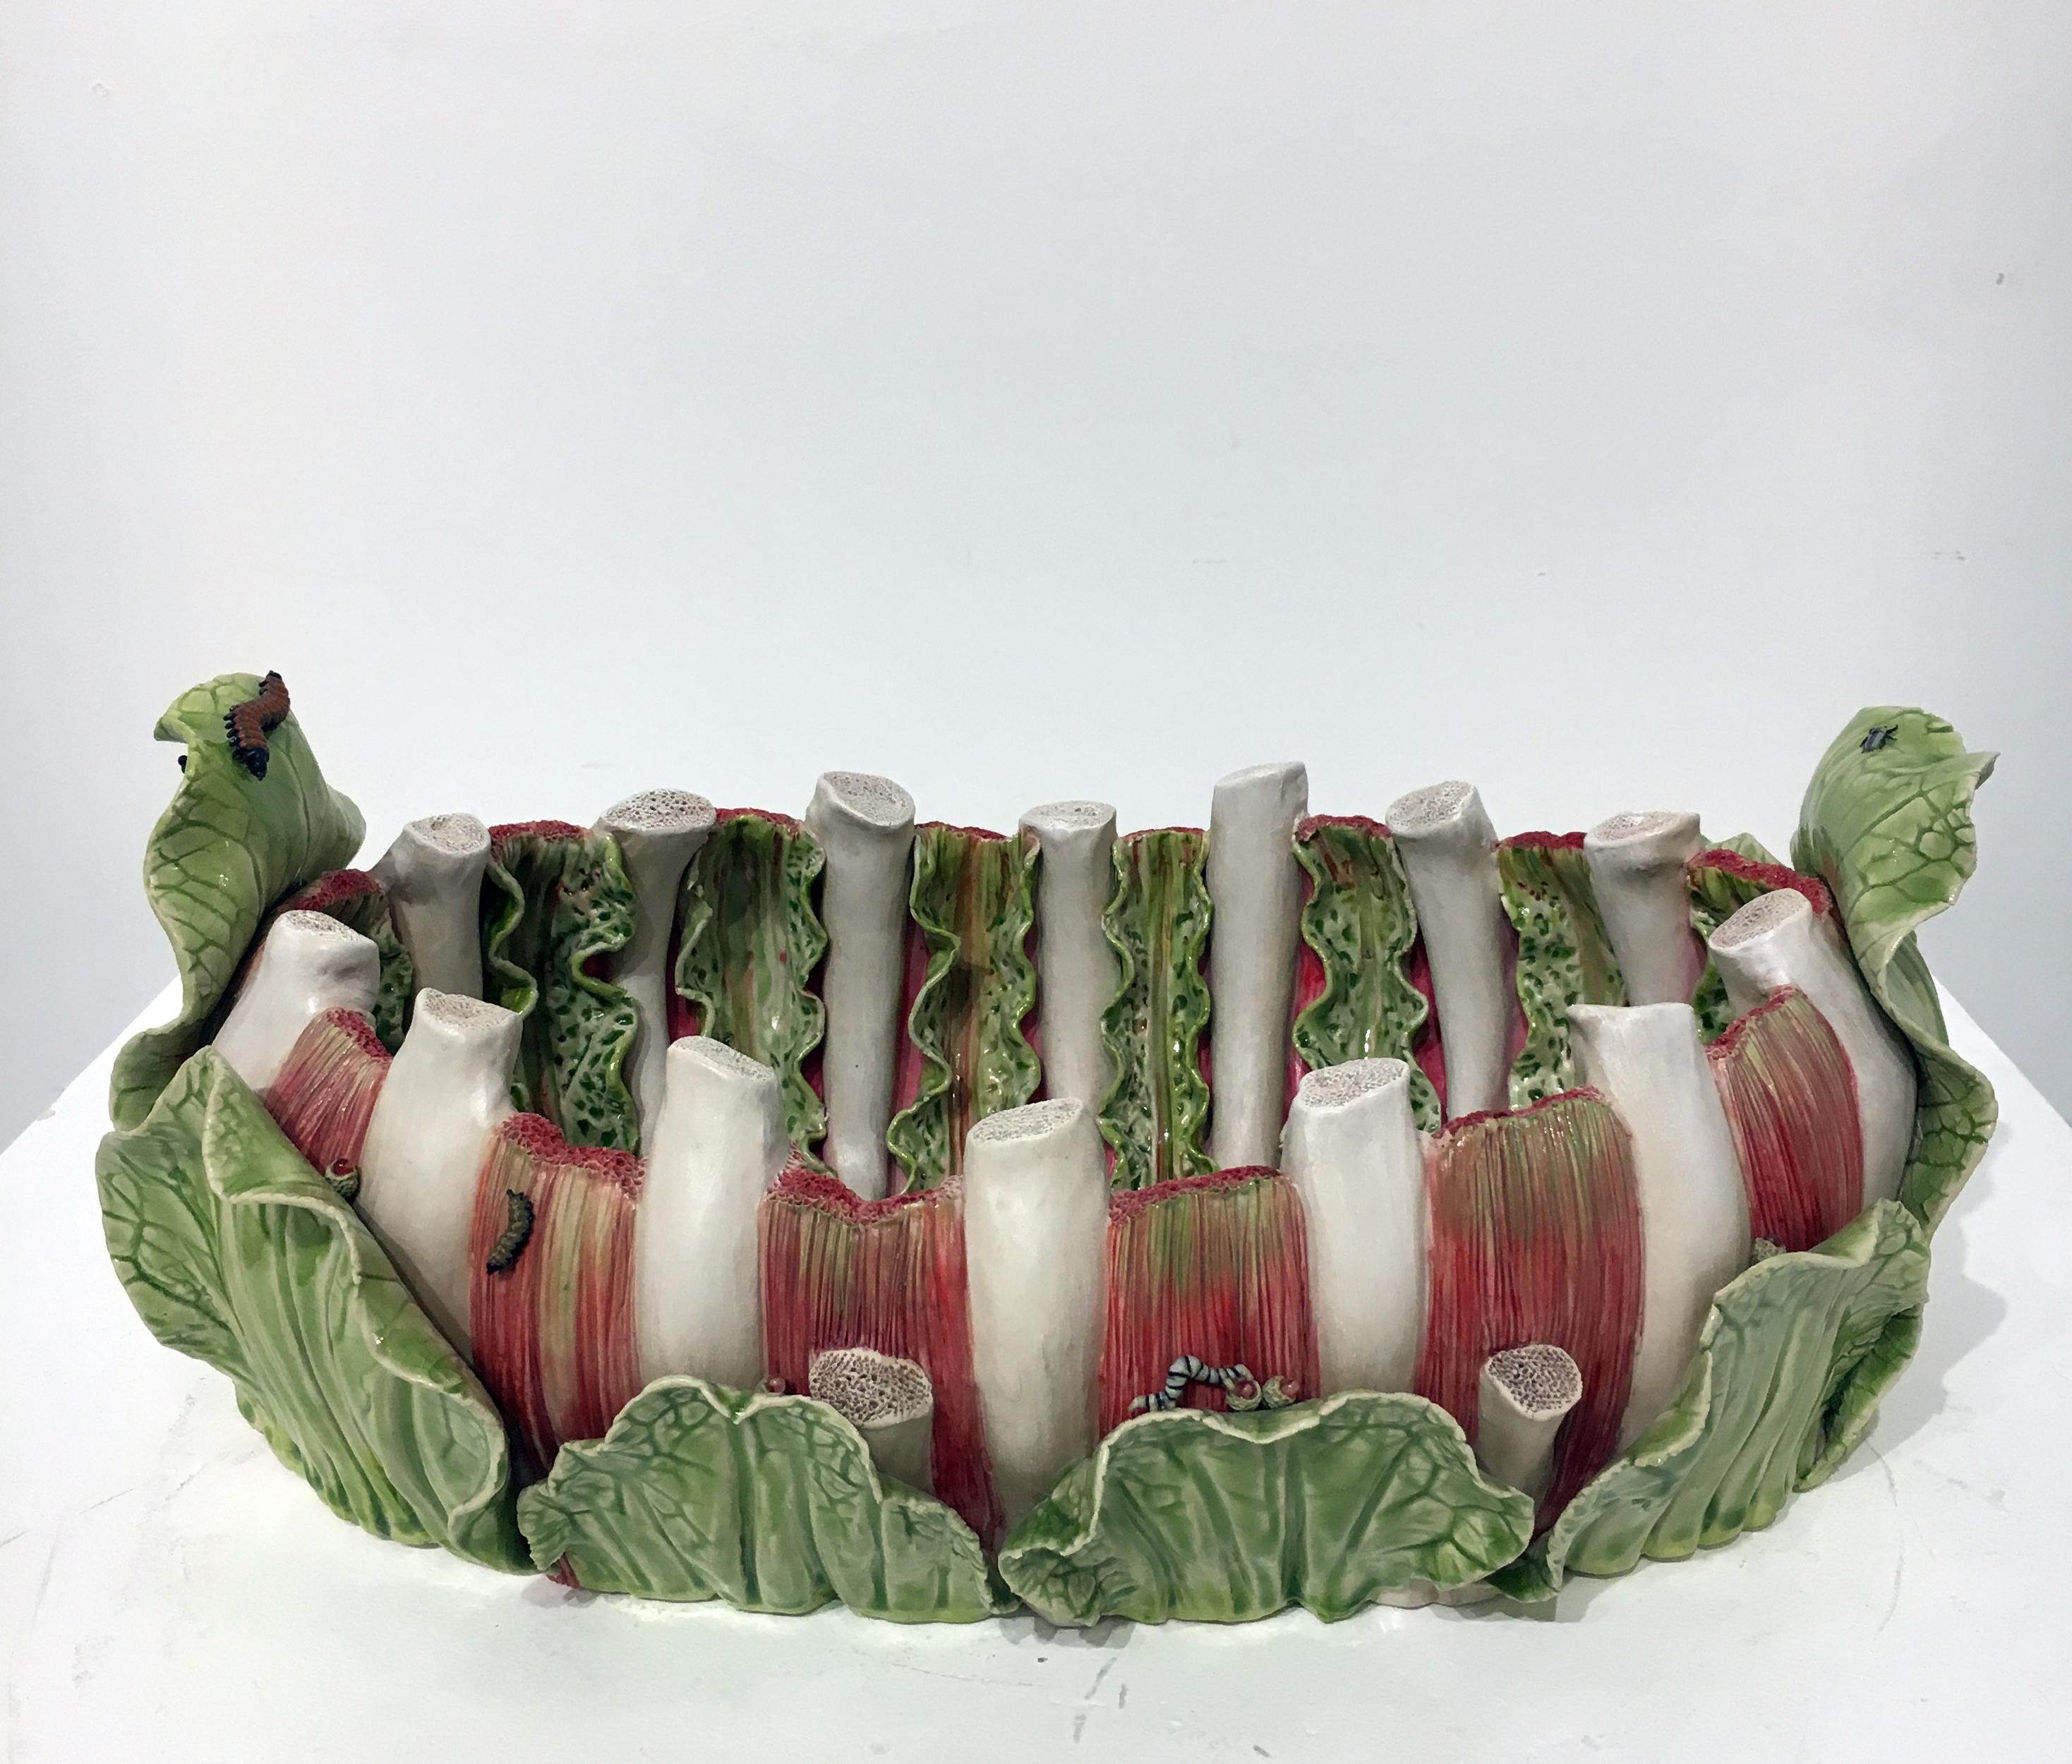 Contemporary Porcelain and Glass Sculpture, Ceramic Design, Surreal, Macabre